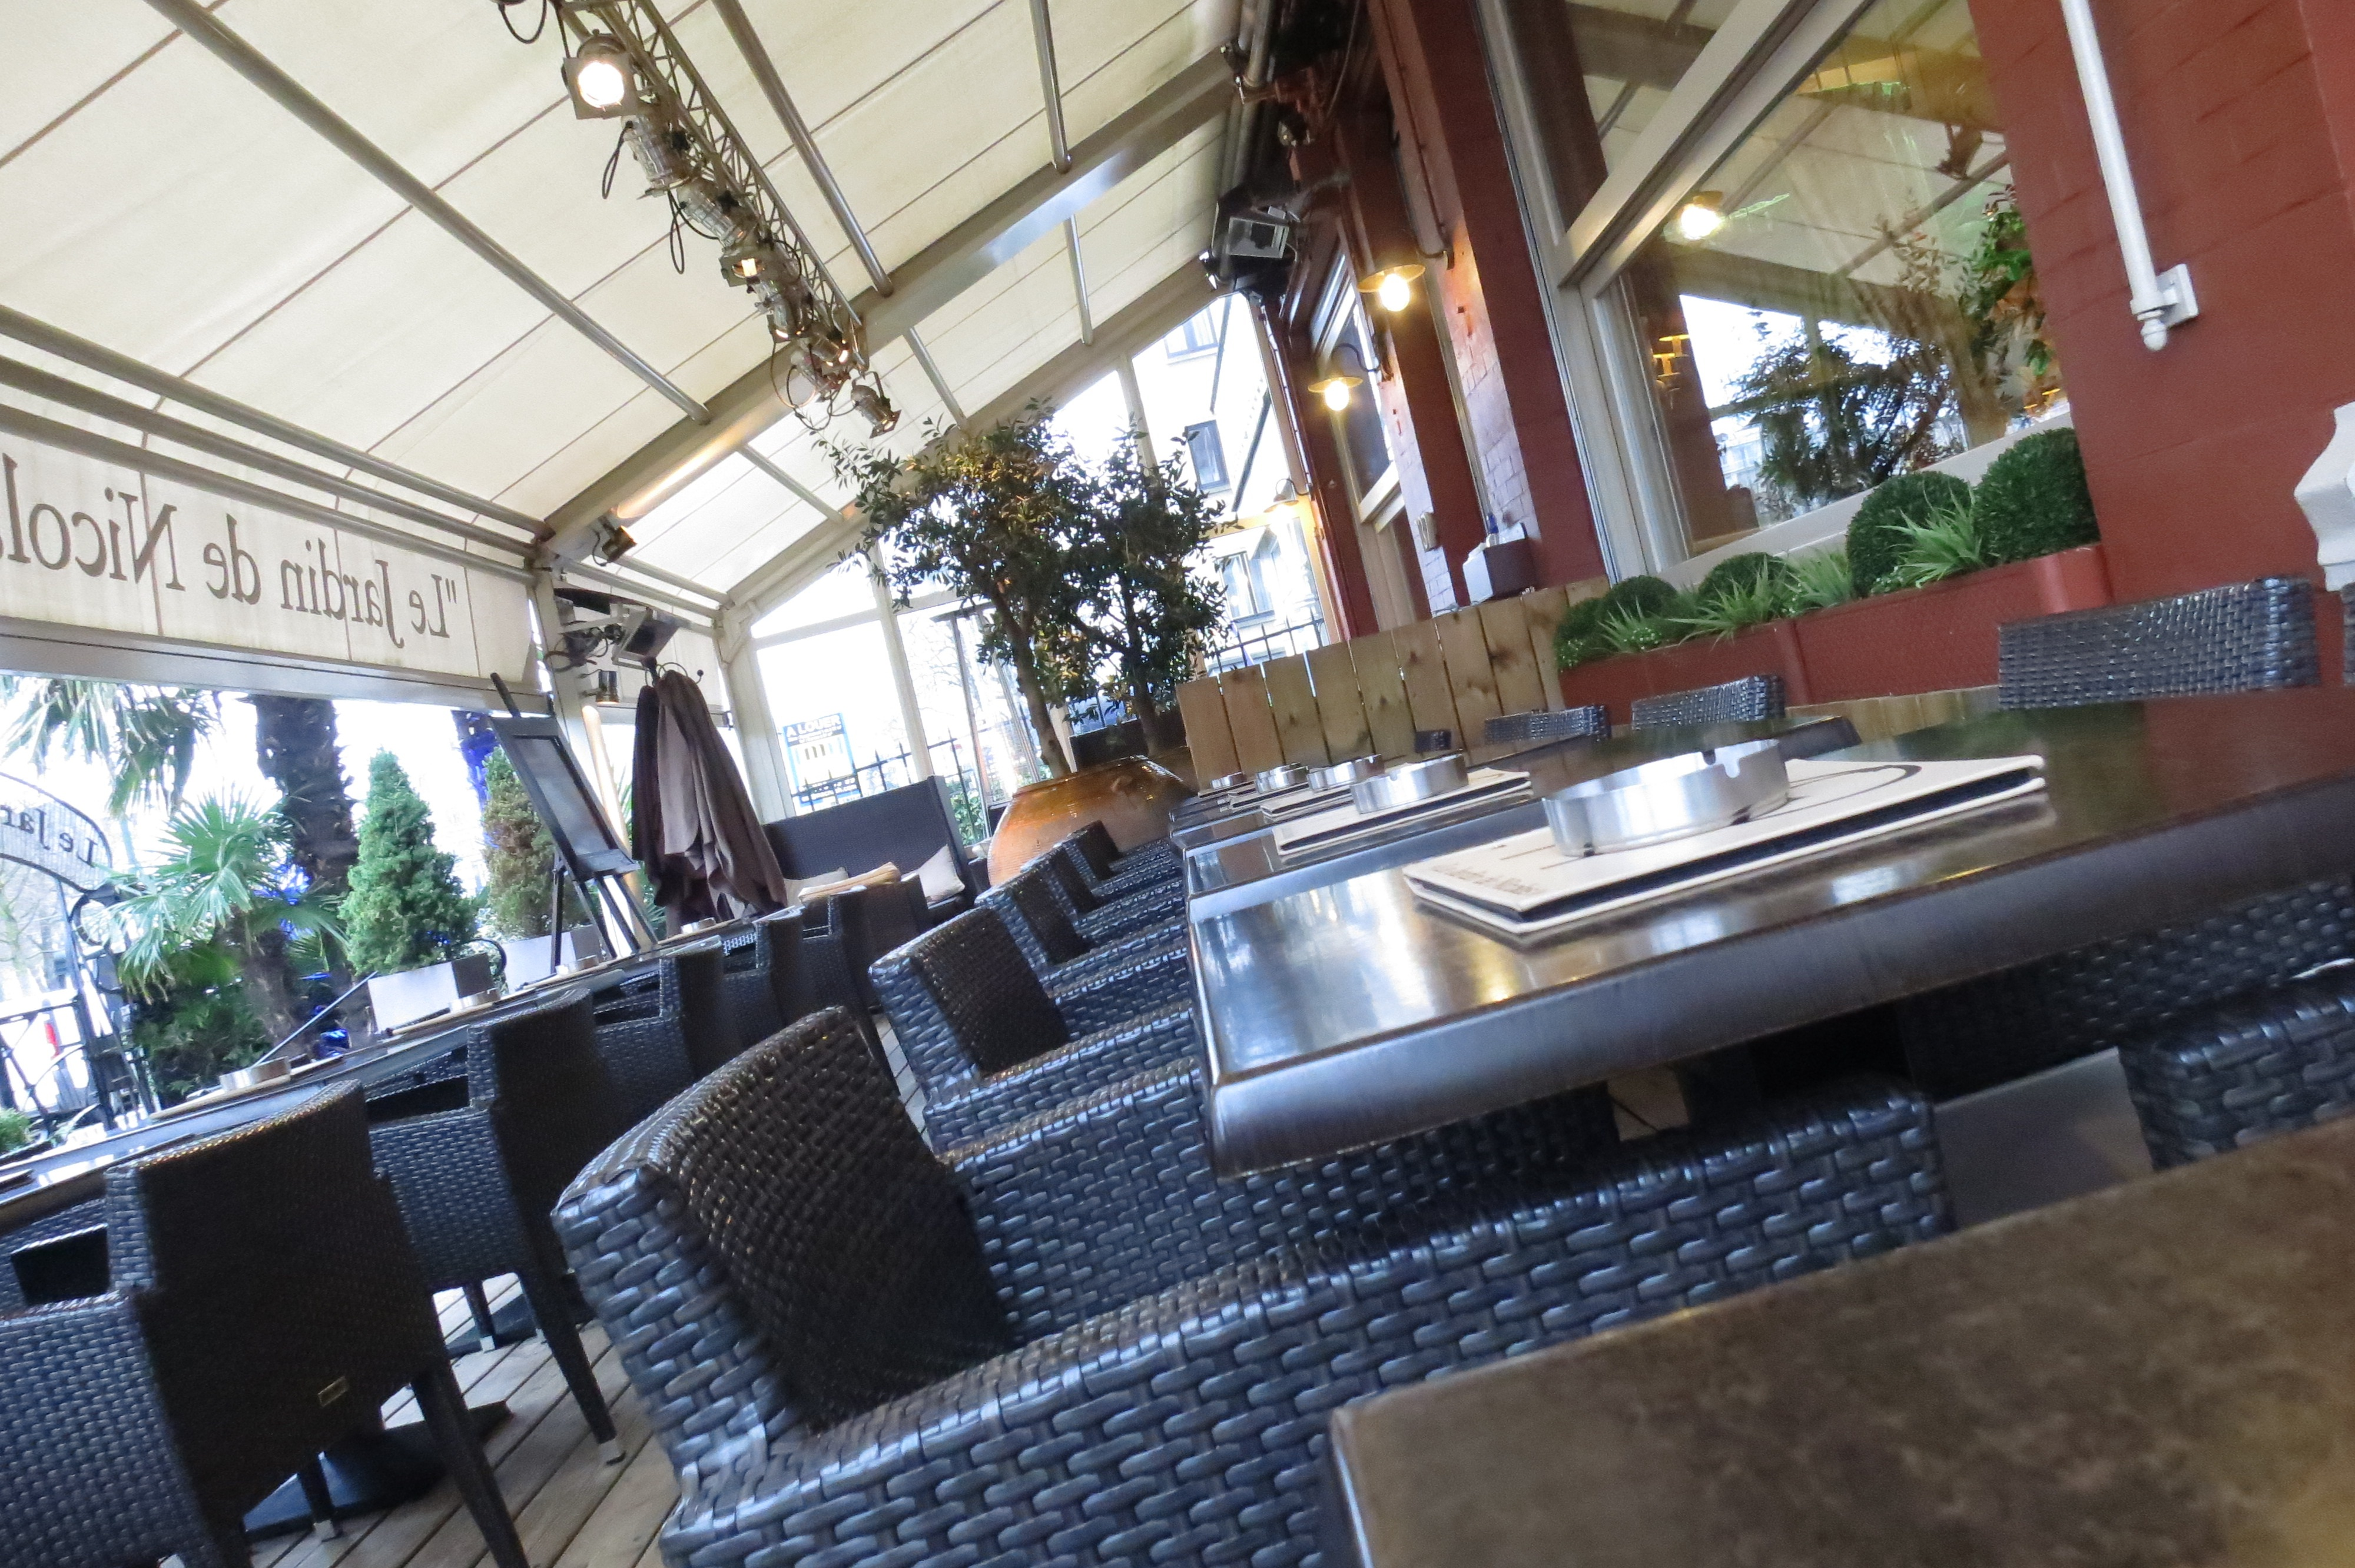 Le jardin de nicolas restaurant fran ais bruxelles - Resto terrasse jardin bruxelles nanterre ...